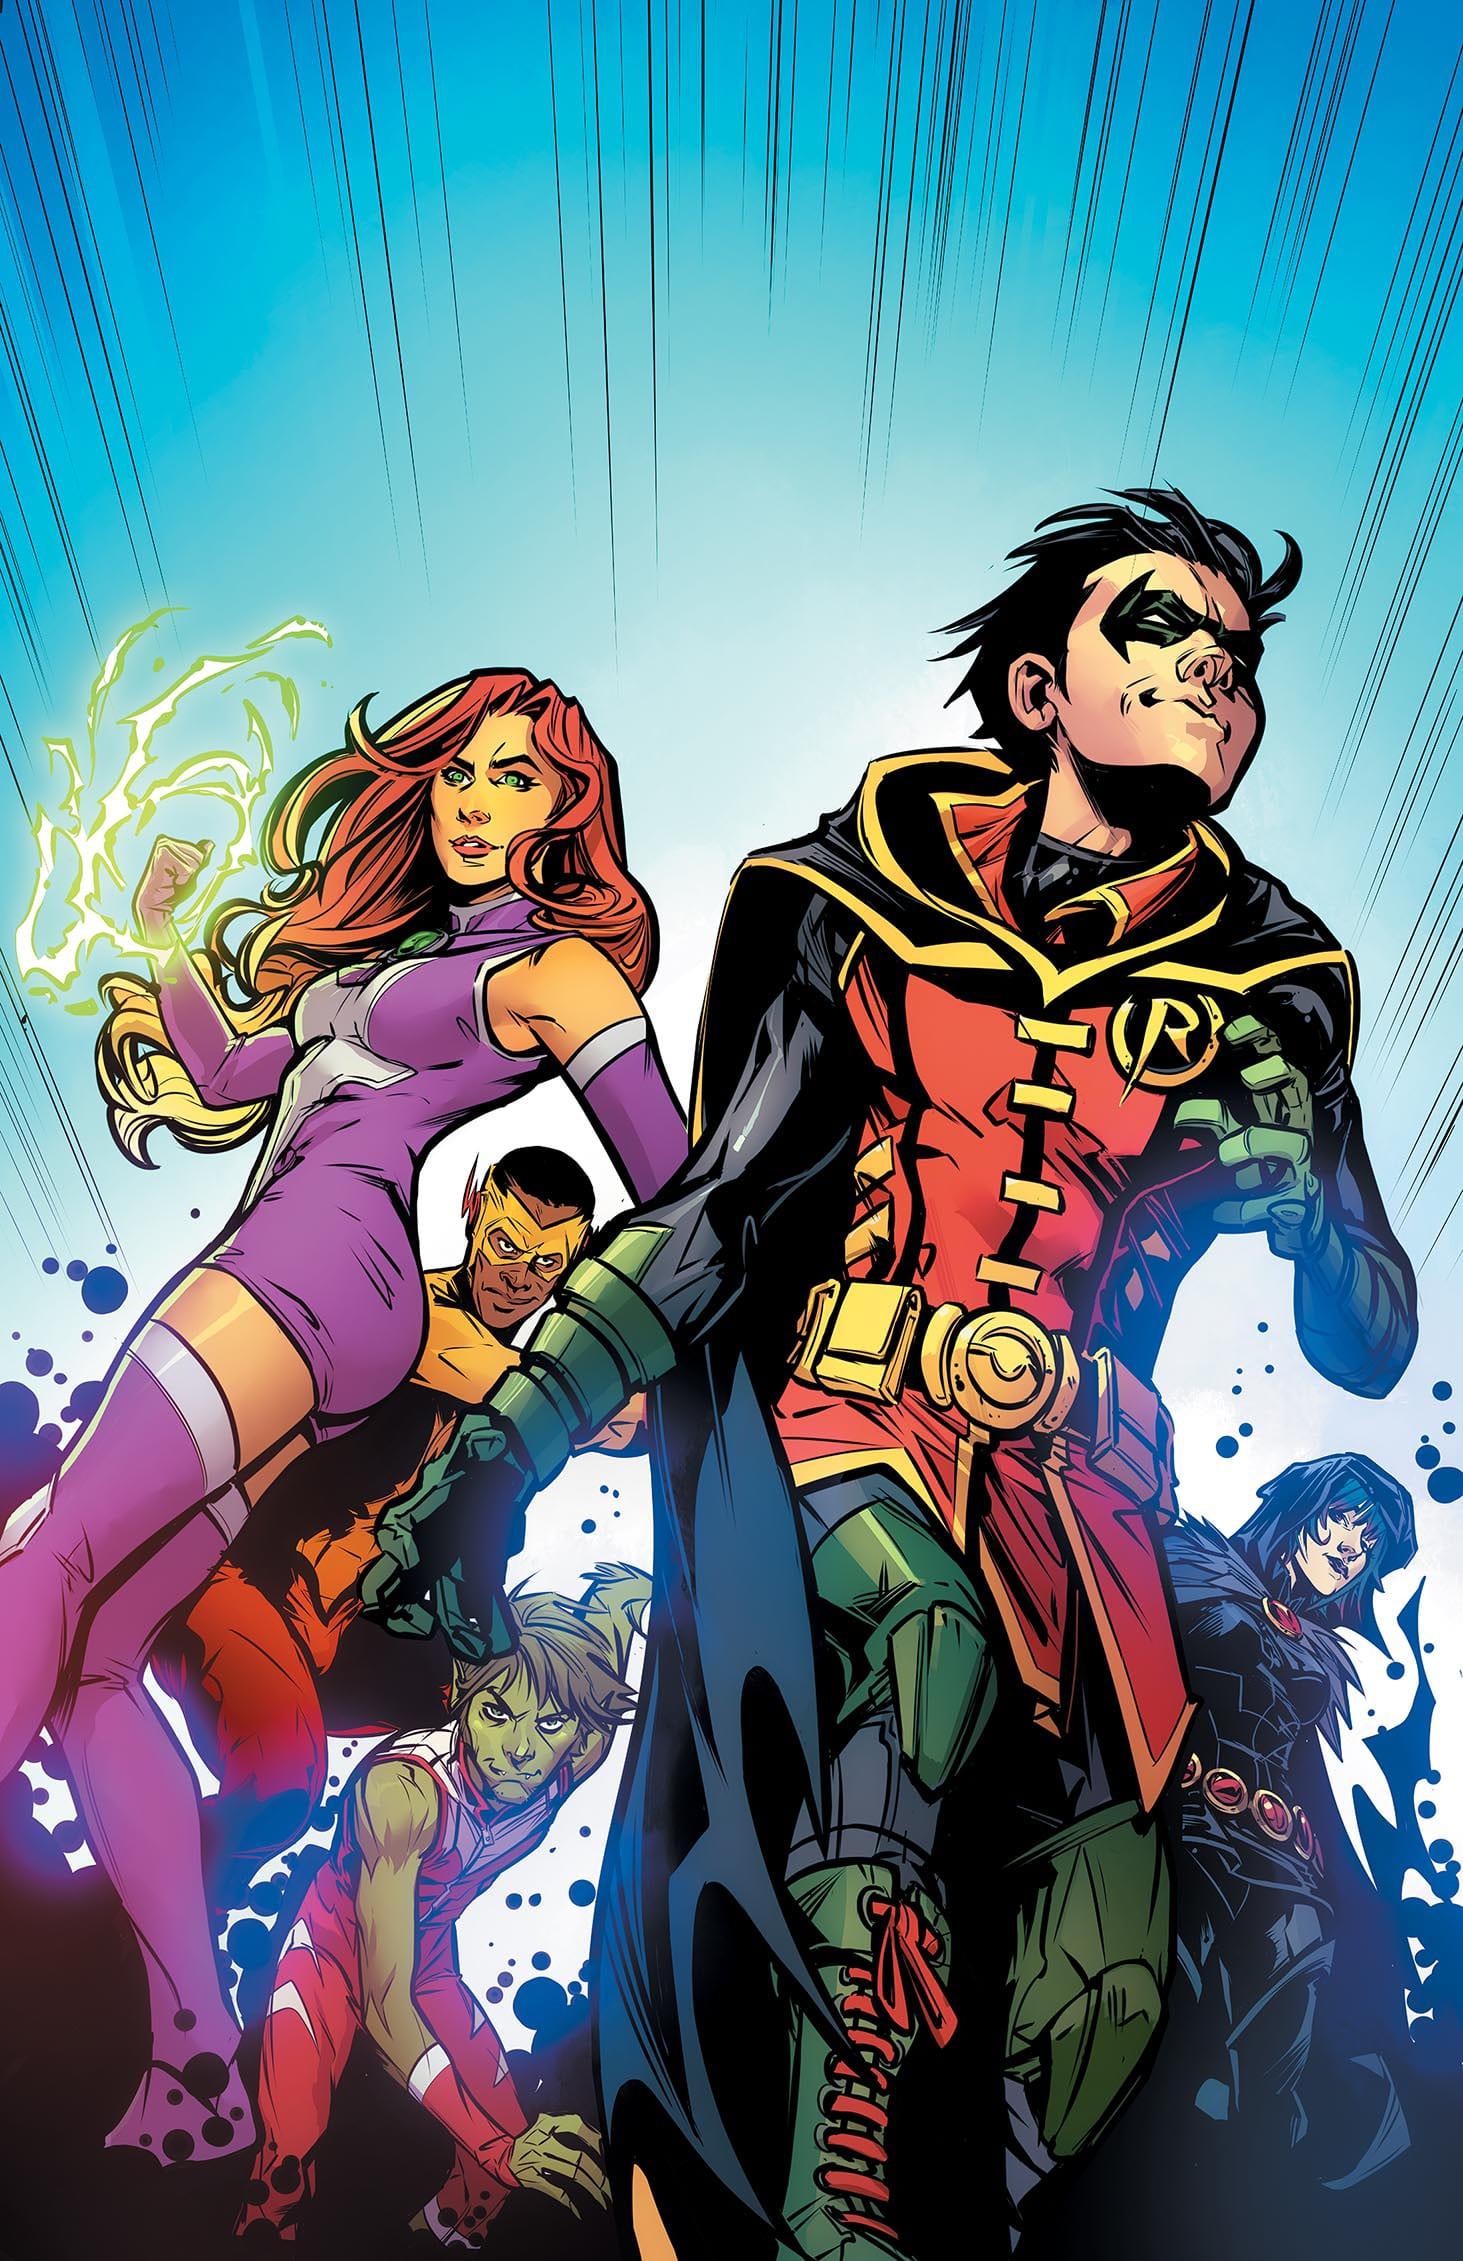 Teen Titans Vol 6 18 Textless Variant.jpg